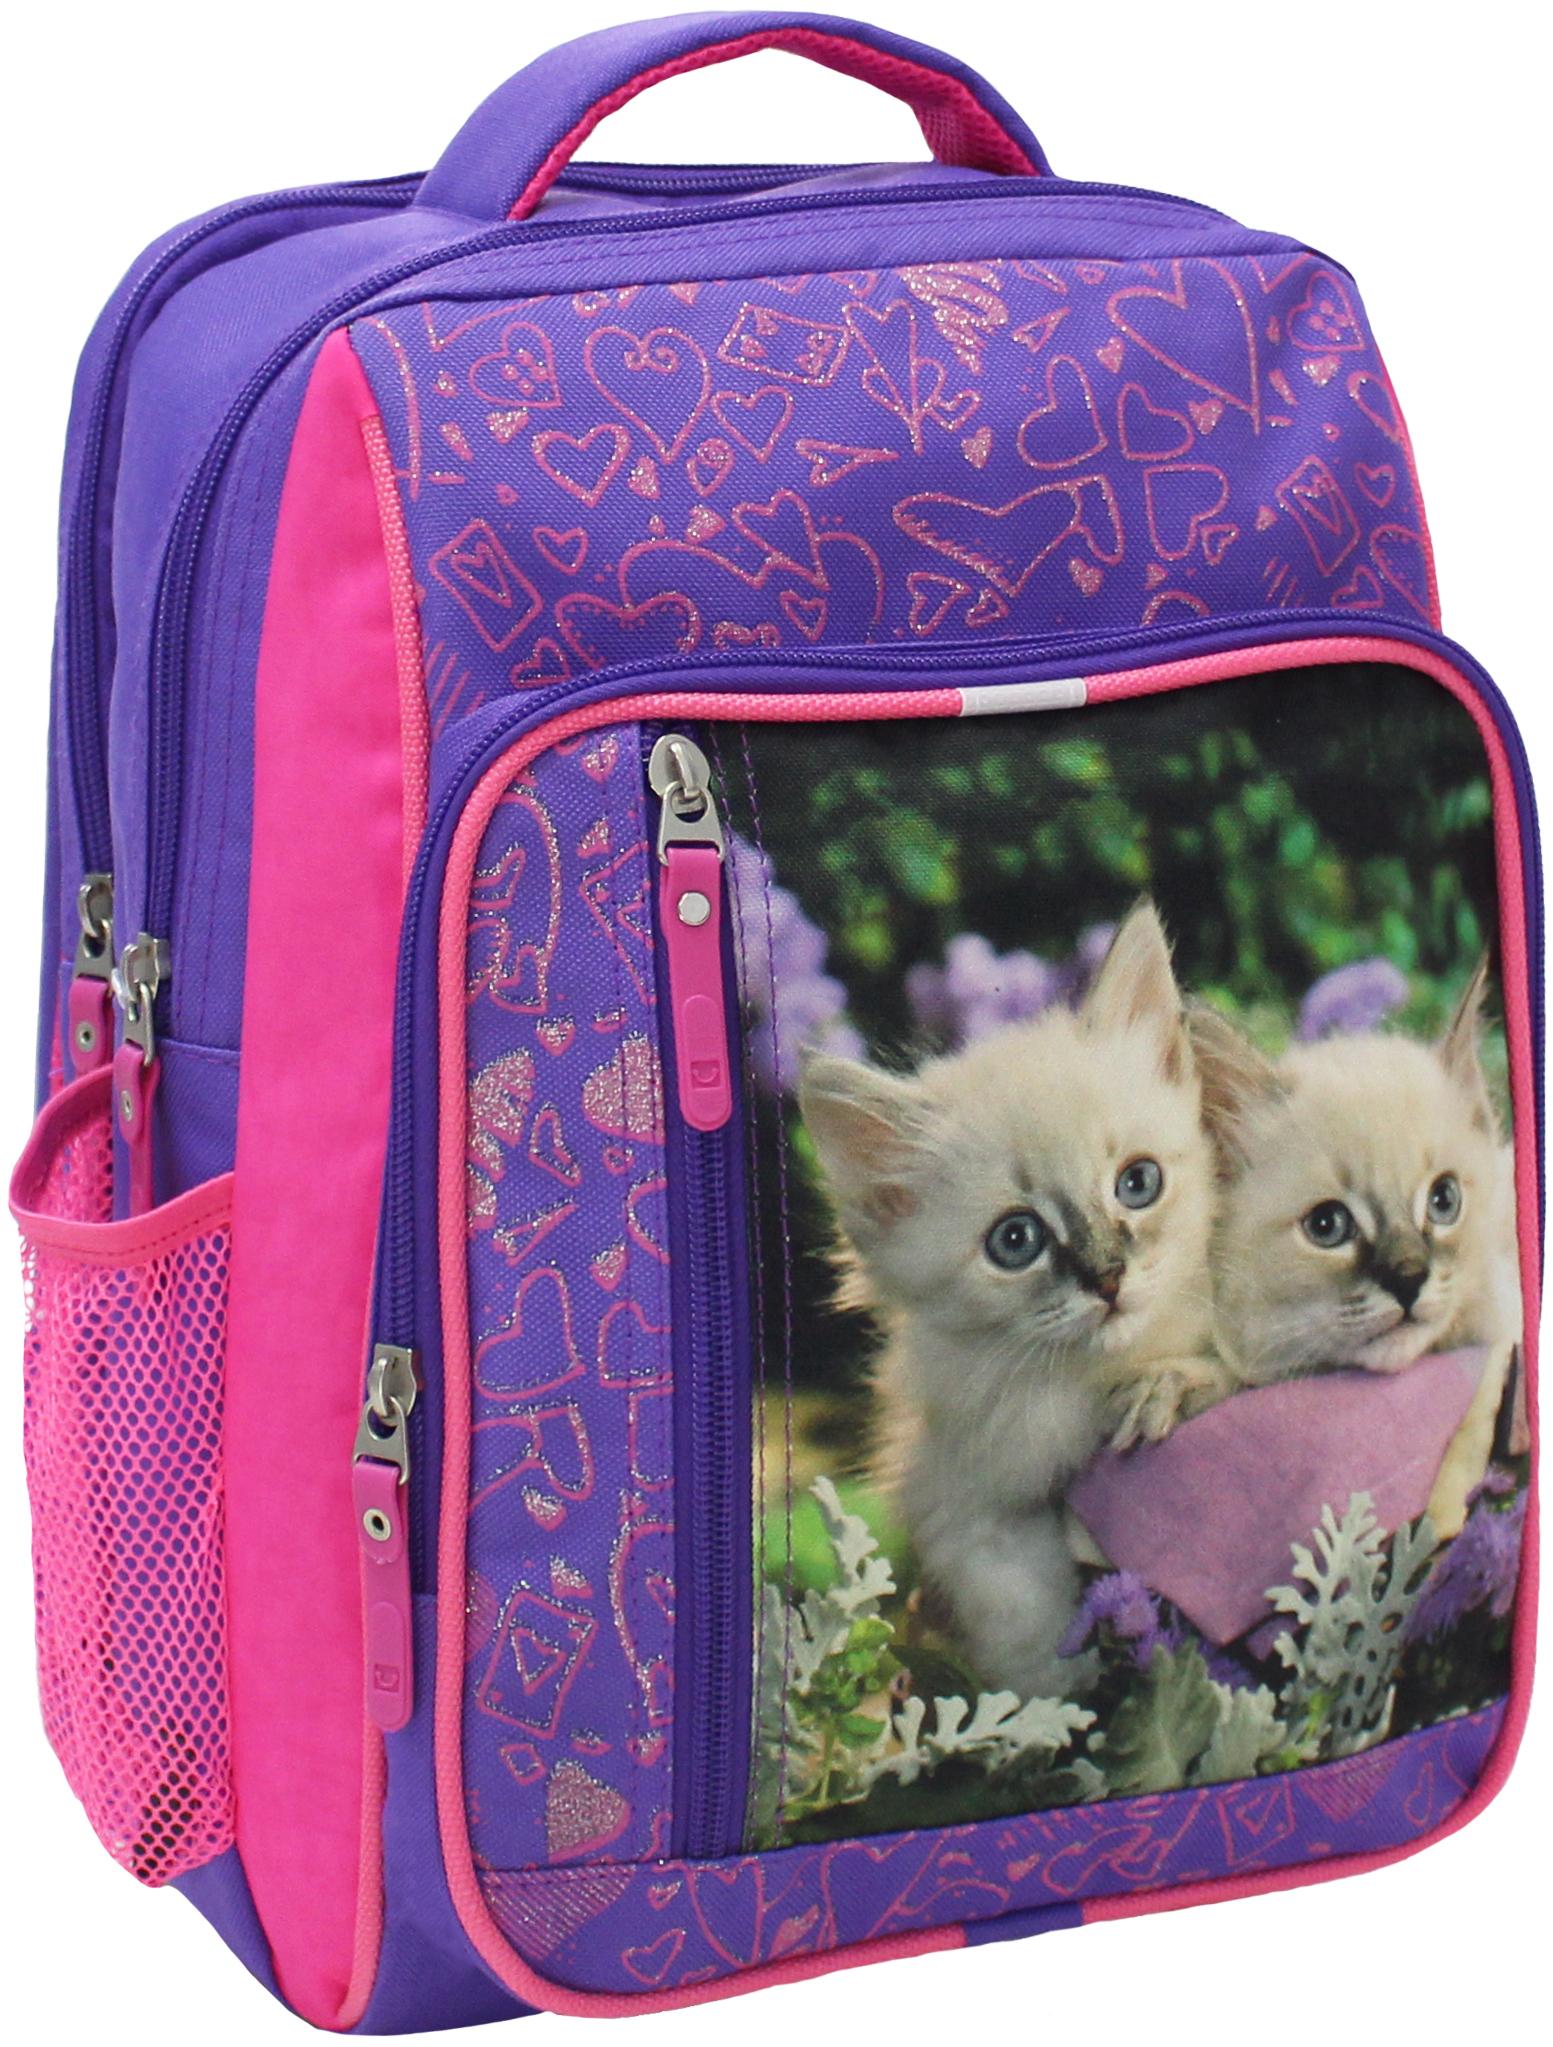 Школьные рюкзаки Рюкзак Bagland Школьник 8 л. 170 фіолетовий 5 д (00112662) IMG_5281.JPG